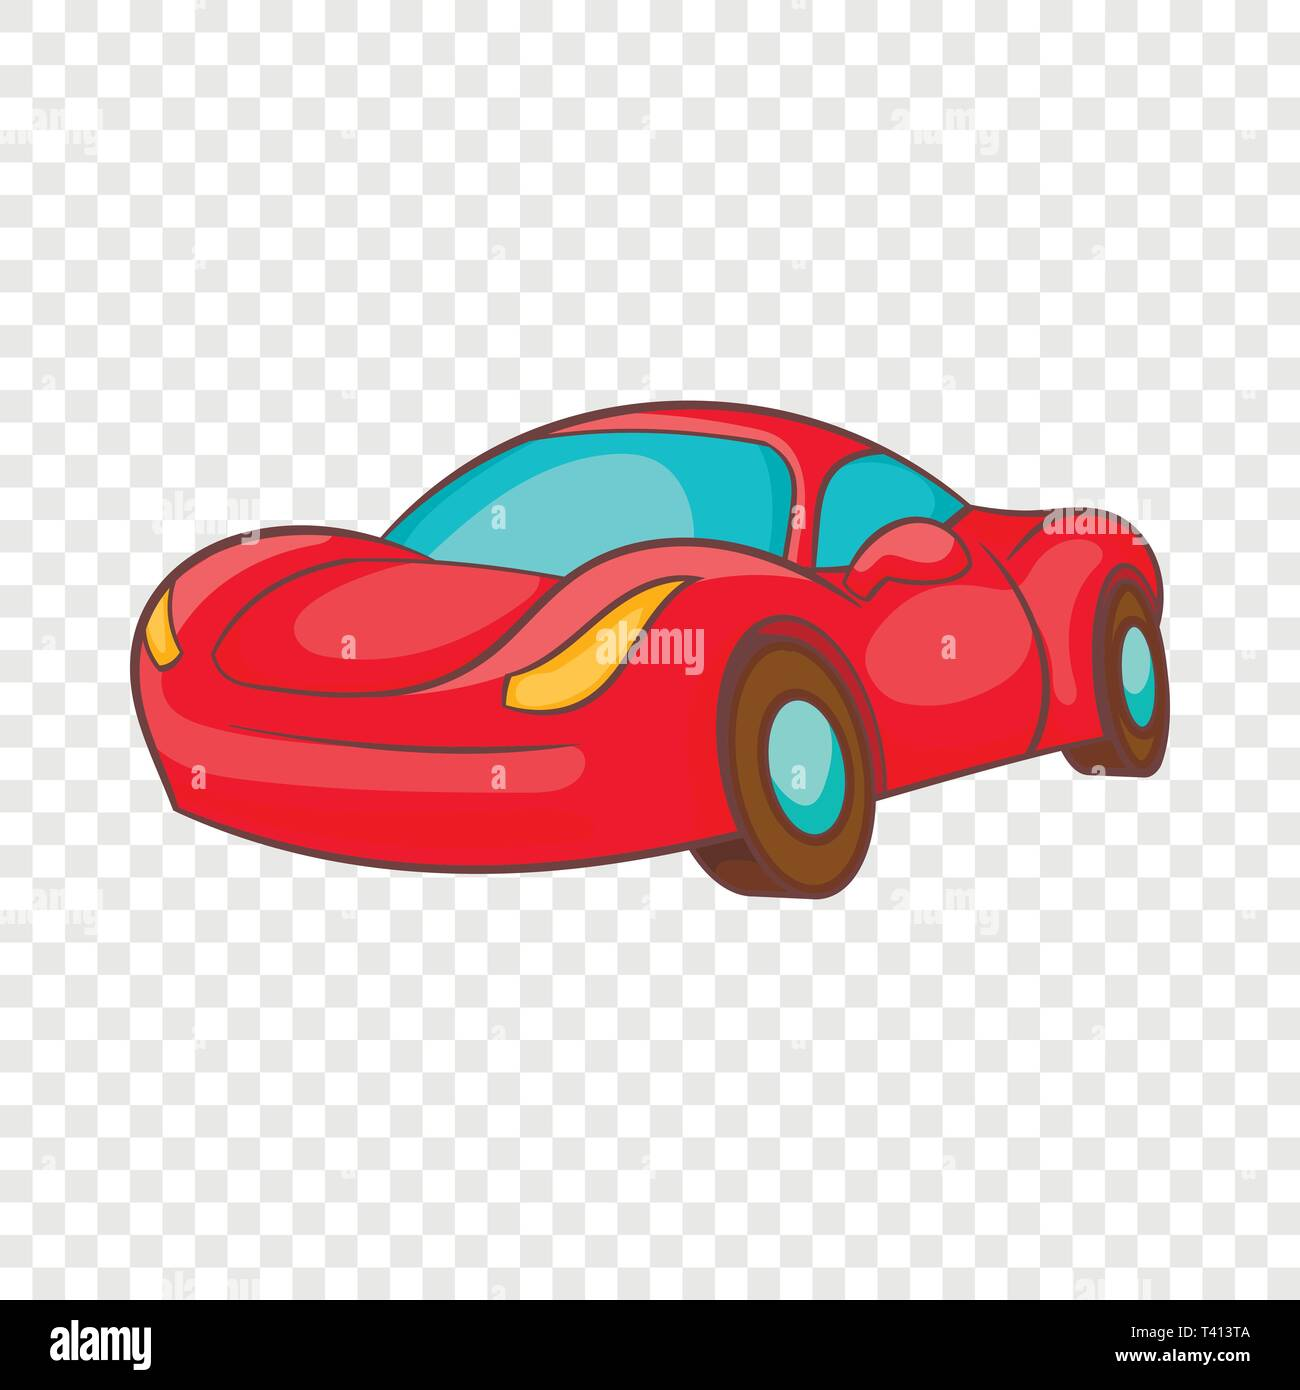 Small red italian car icon, cartoon style - Stock Image